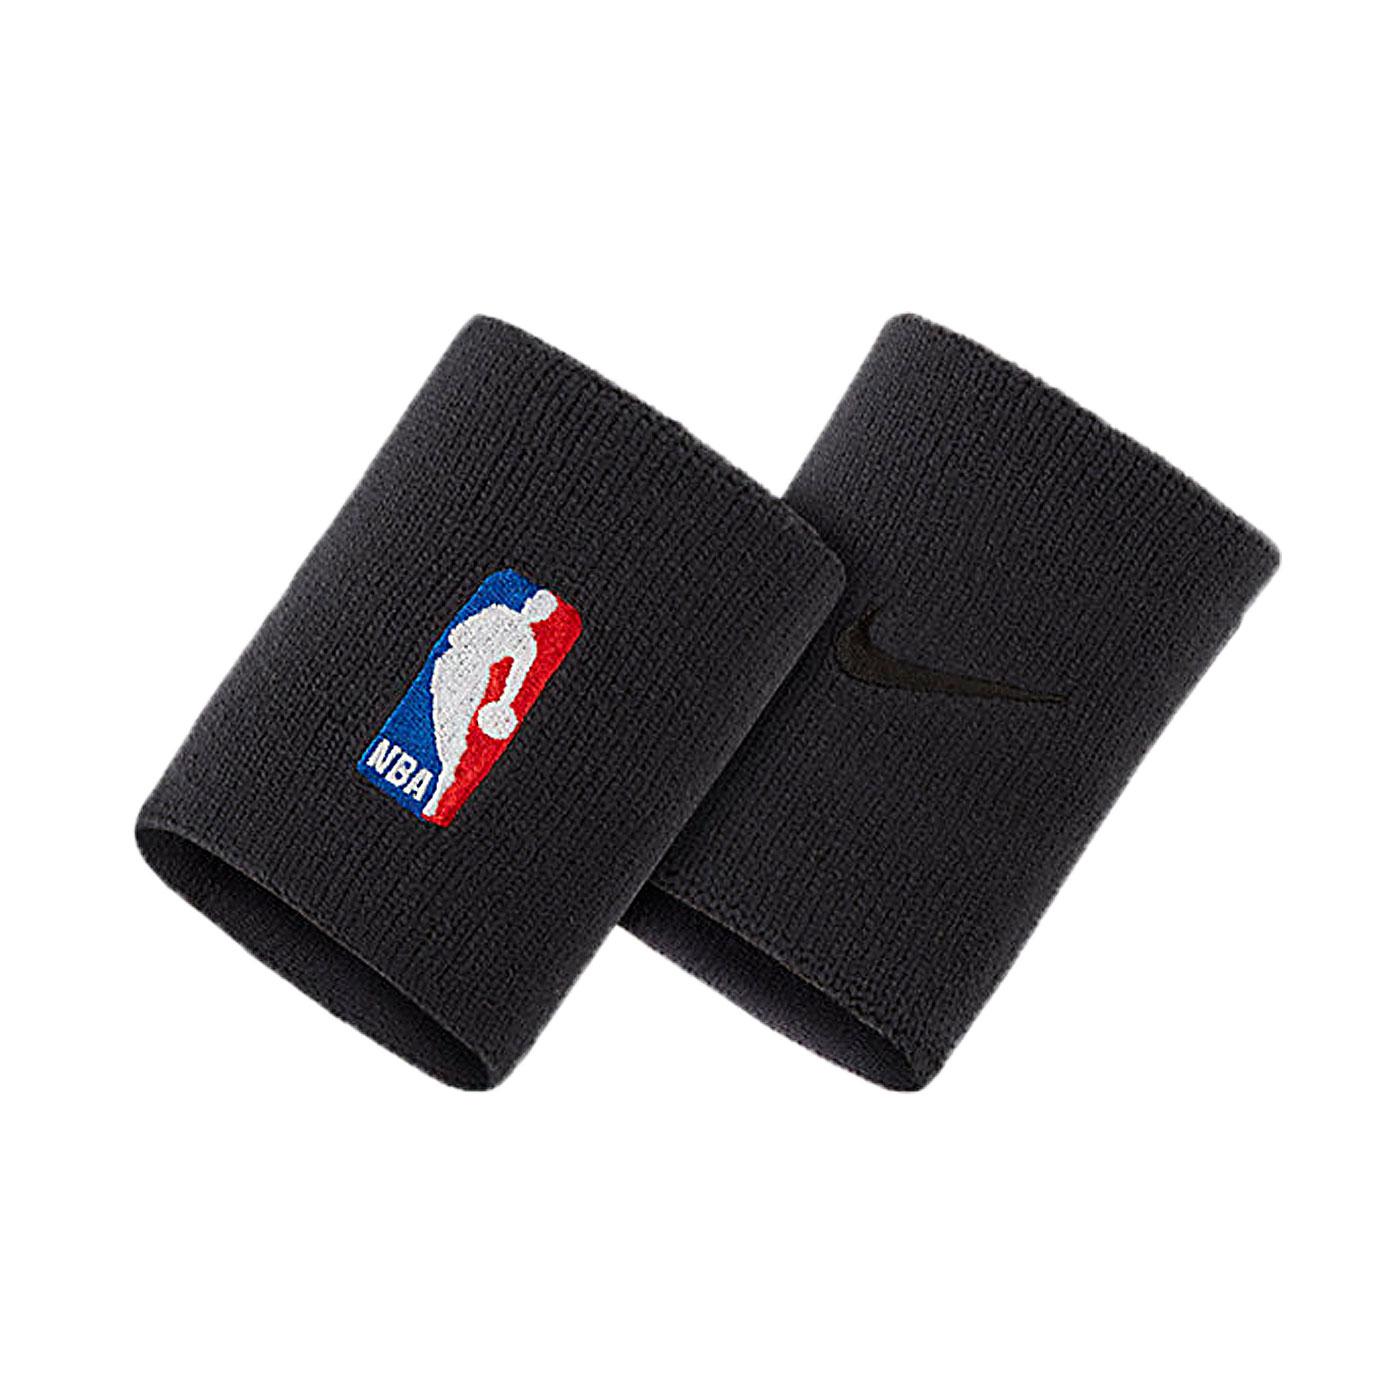 NIKE NBA DRI-FIT 護腕套(馬刺) NKN03001OS - 黑白紅